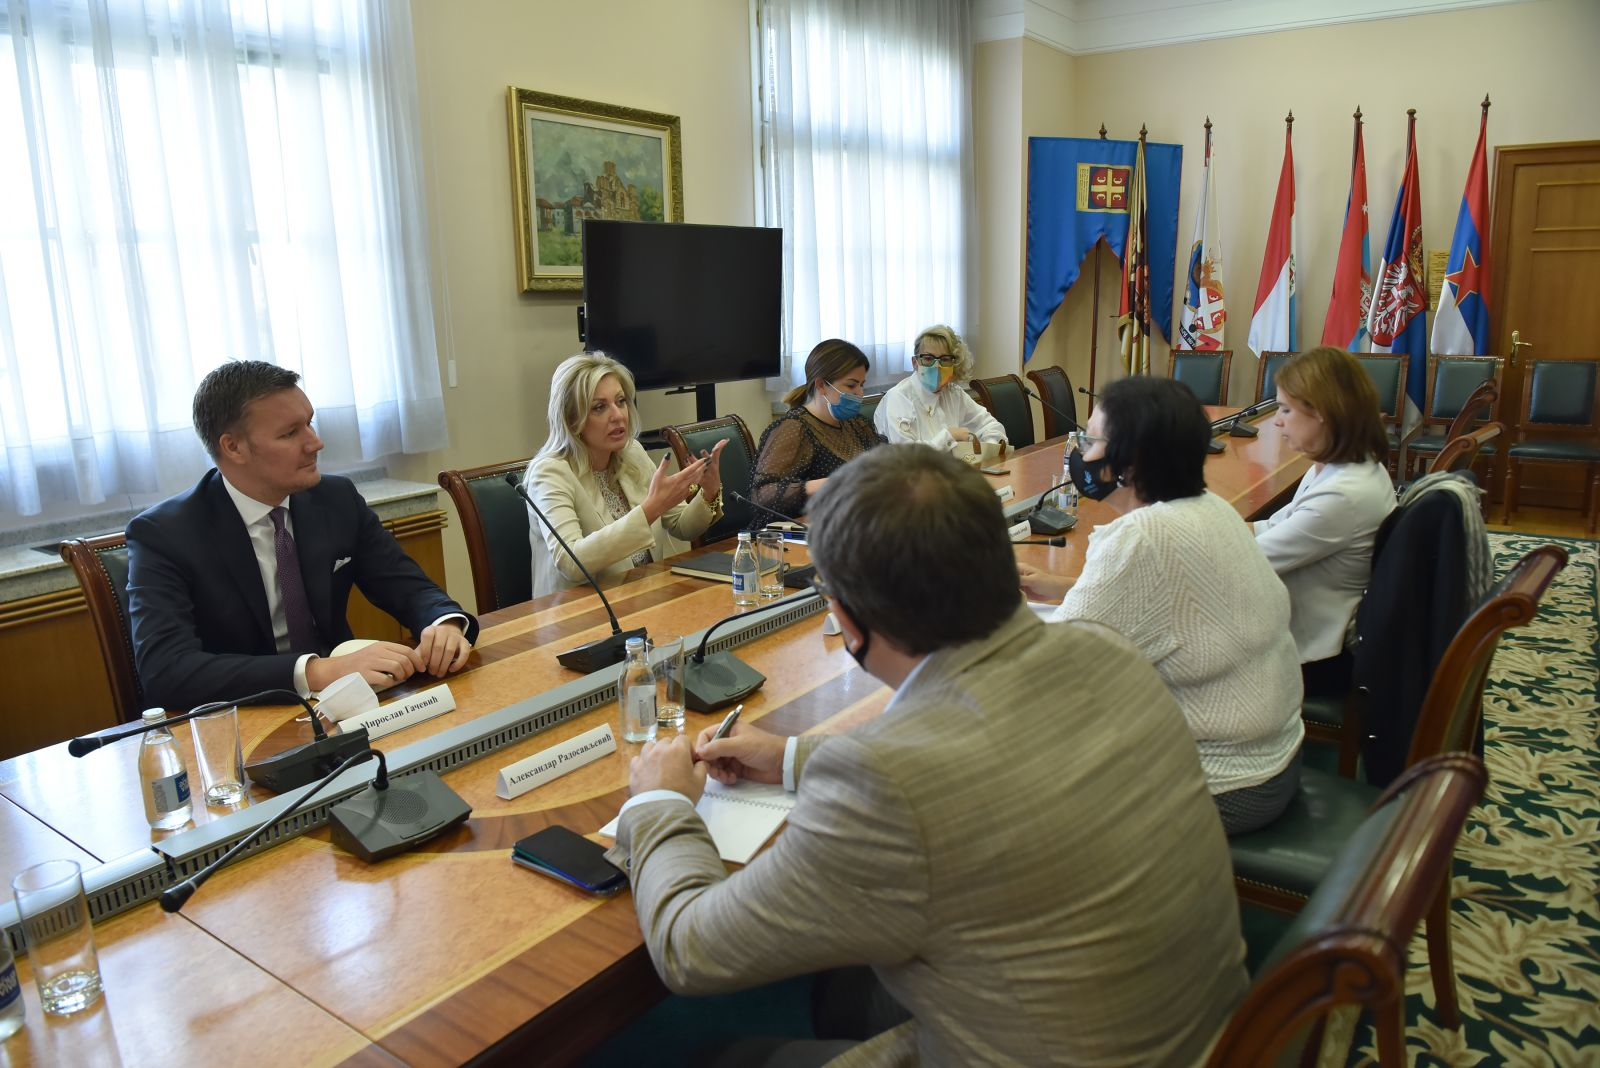 J. Joksimović and Čomić: Team for the Conference on the Future of Europe formed